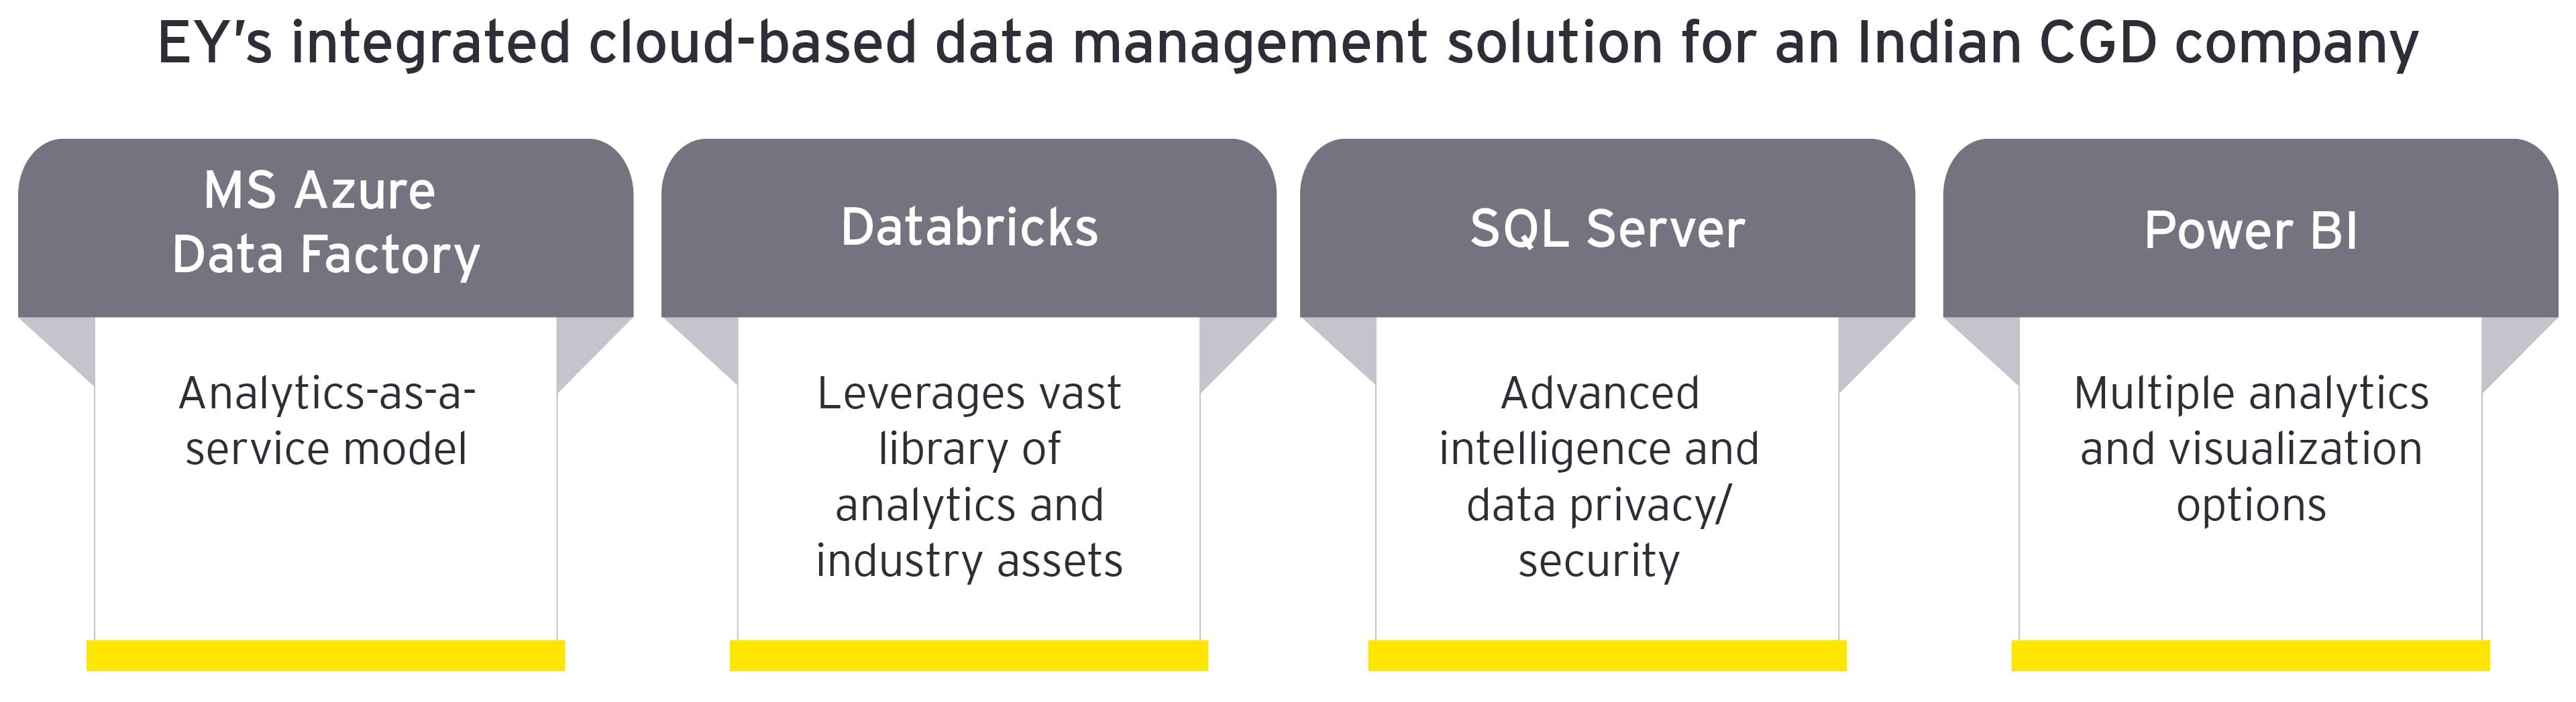 Cloud based data management solution